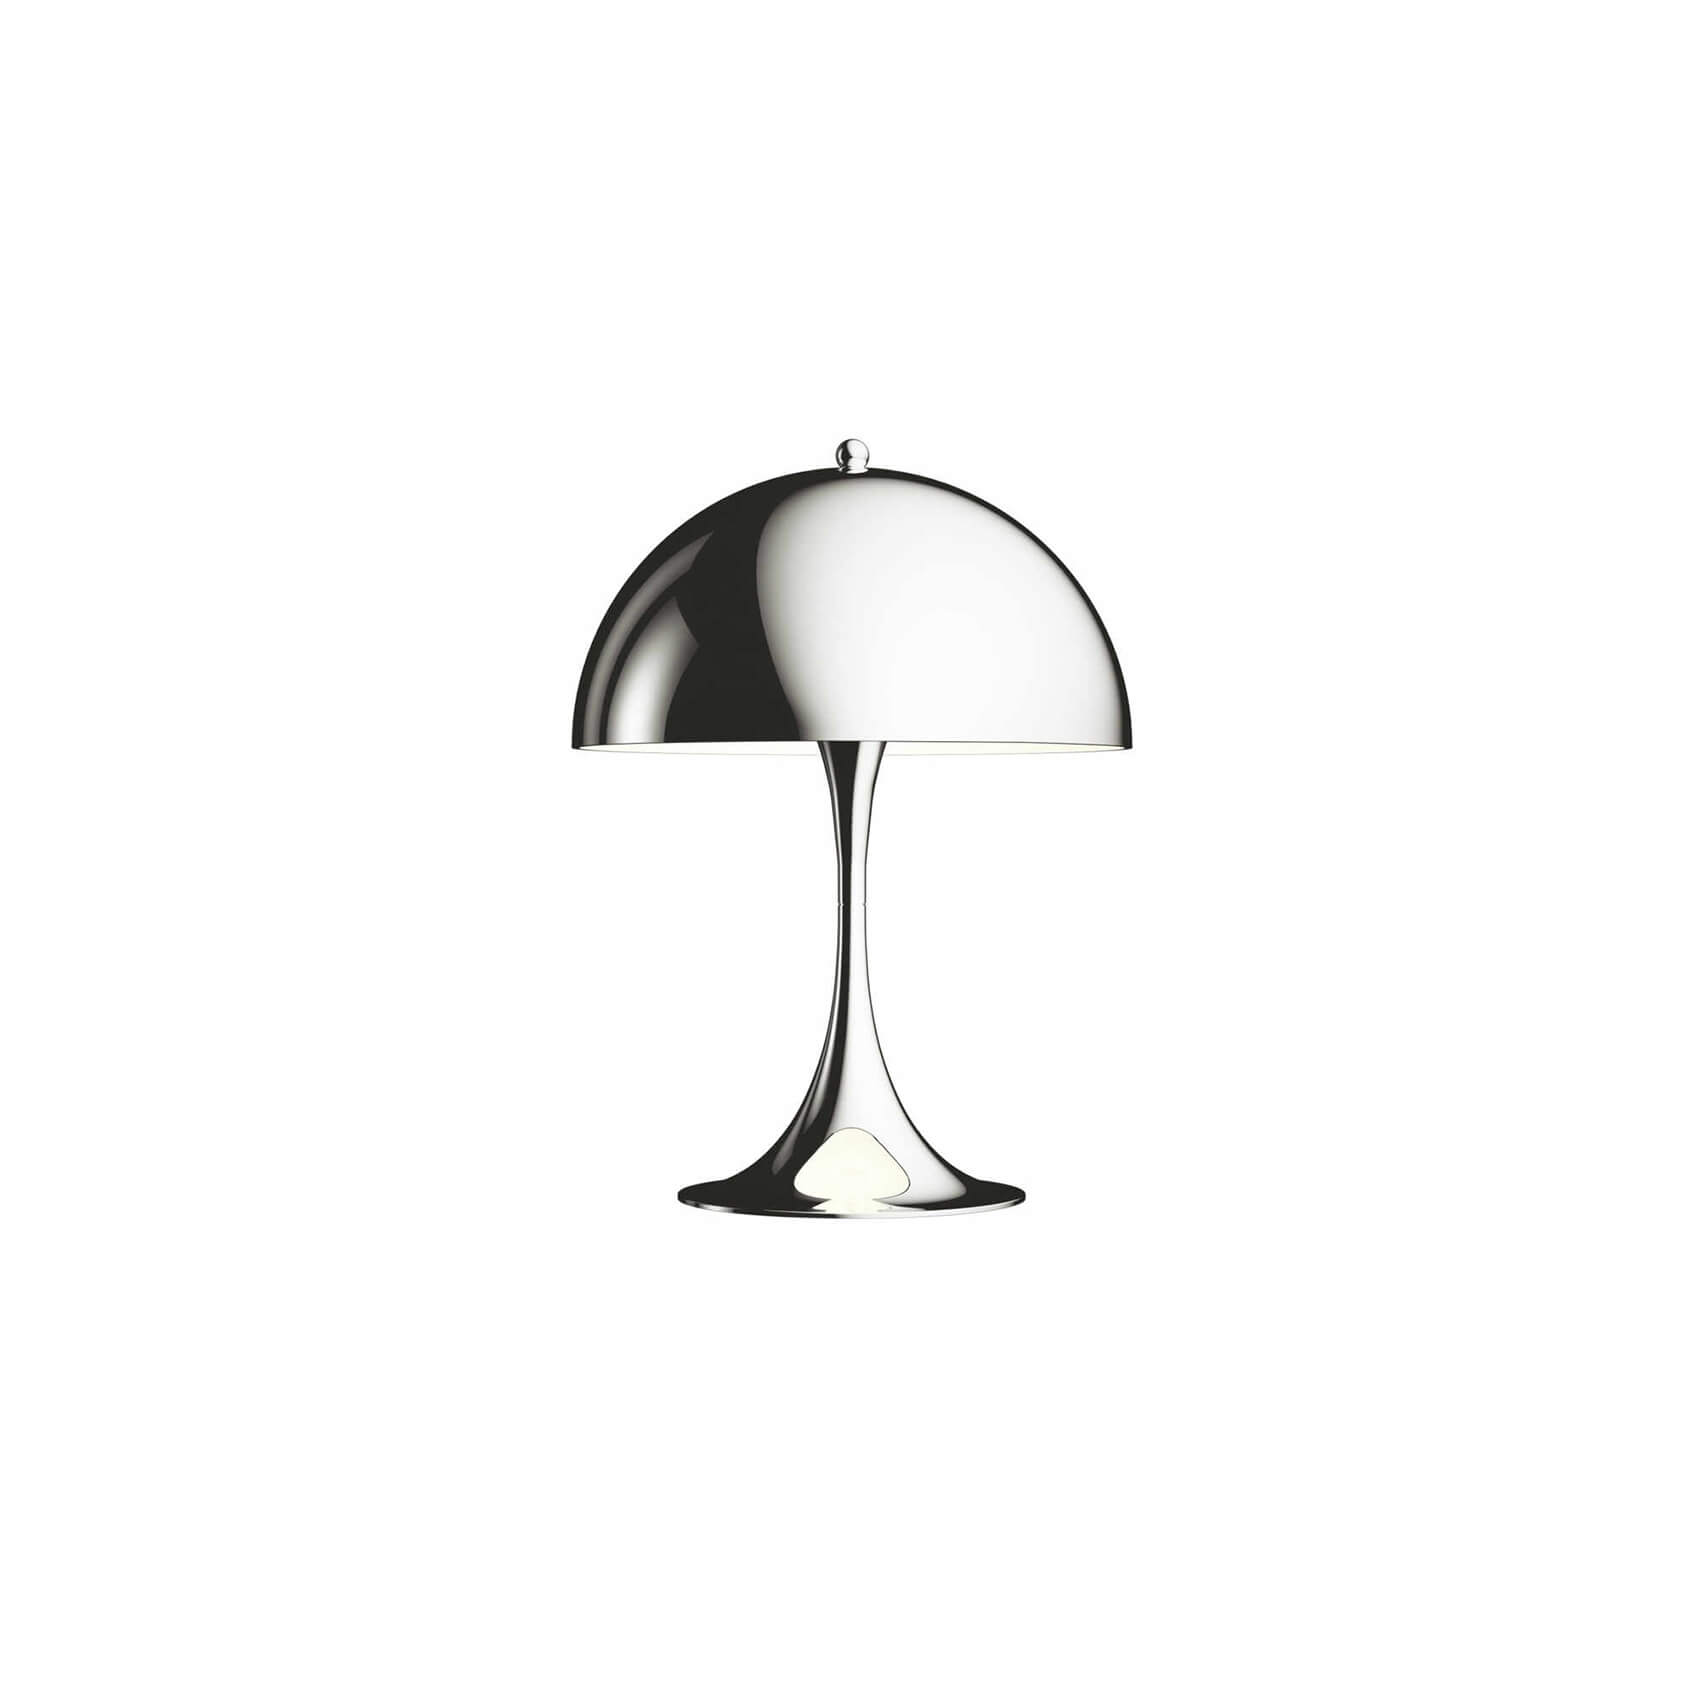 High lustre chrome plated - +$164.63